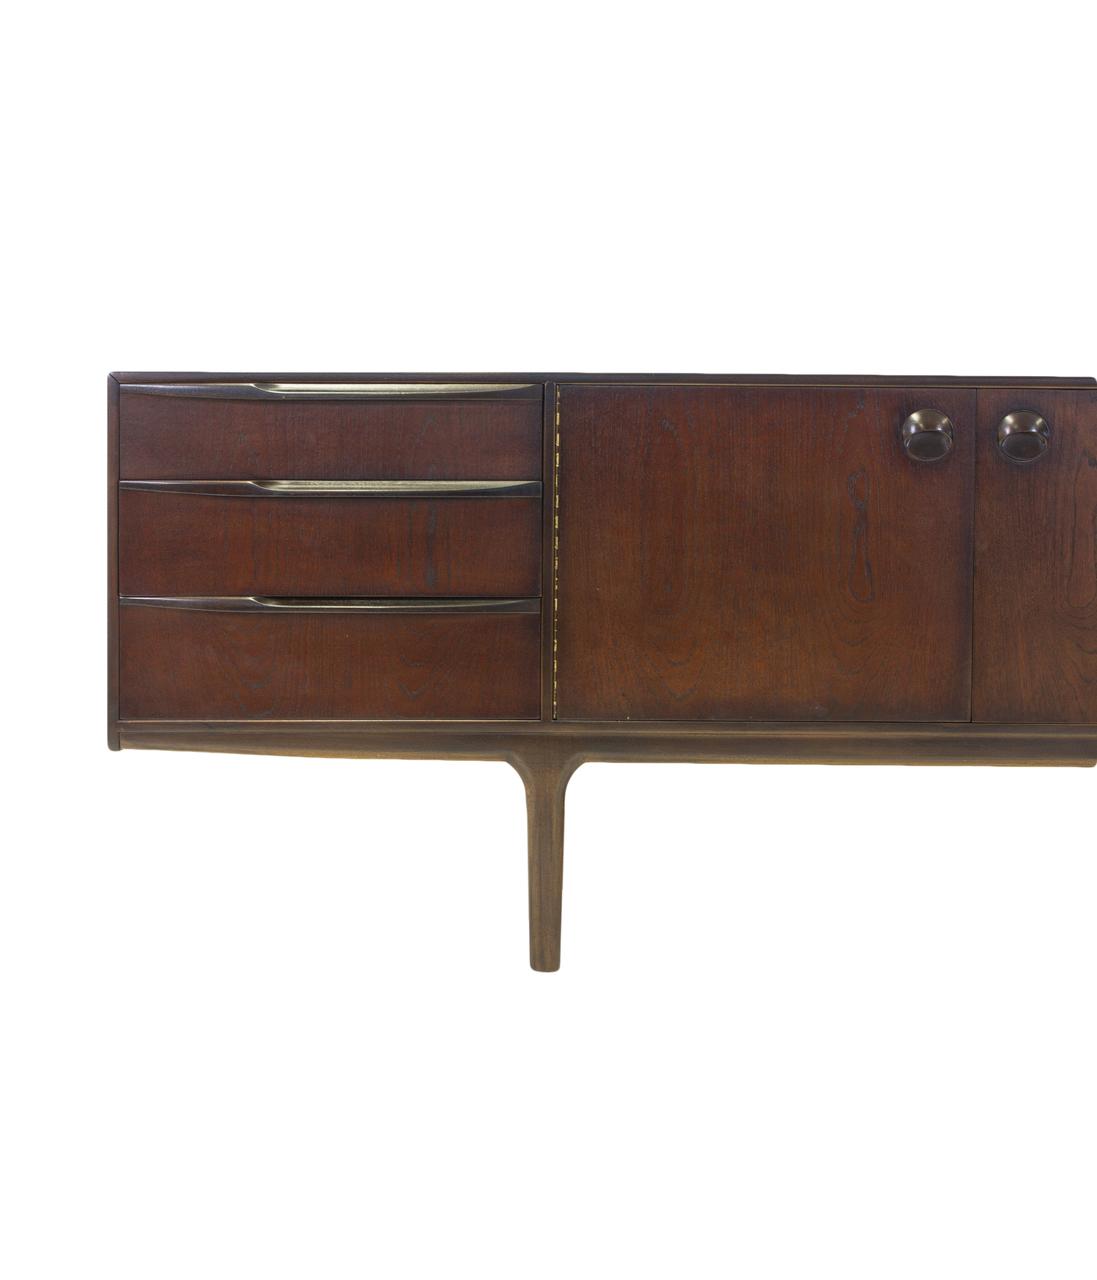 mid century modern mcintosh credenza sideboard media console tv stand dresser ebay. Black Bedroom Furniture Sets. Home Design Ideas